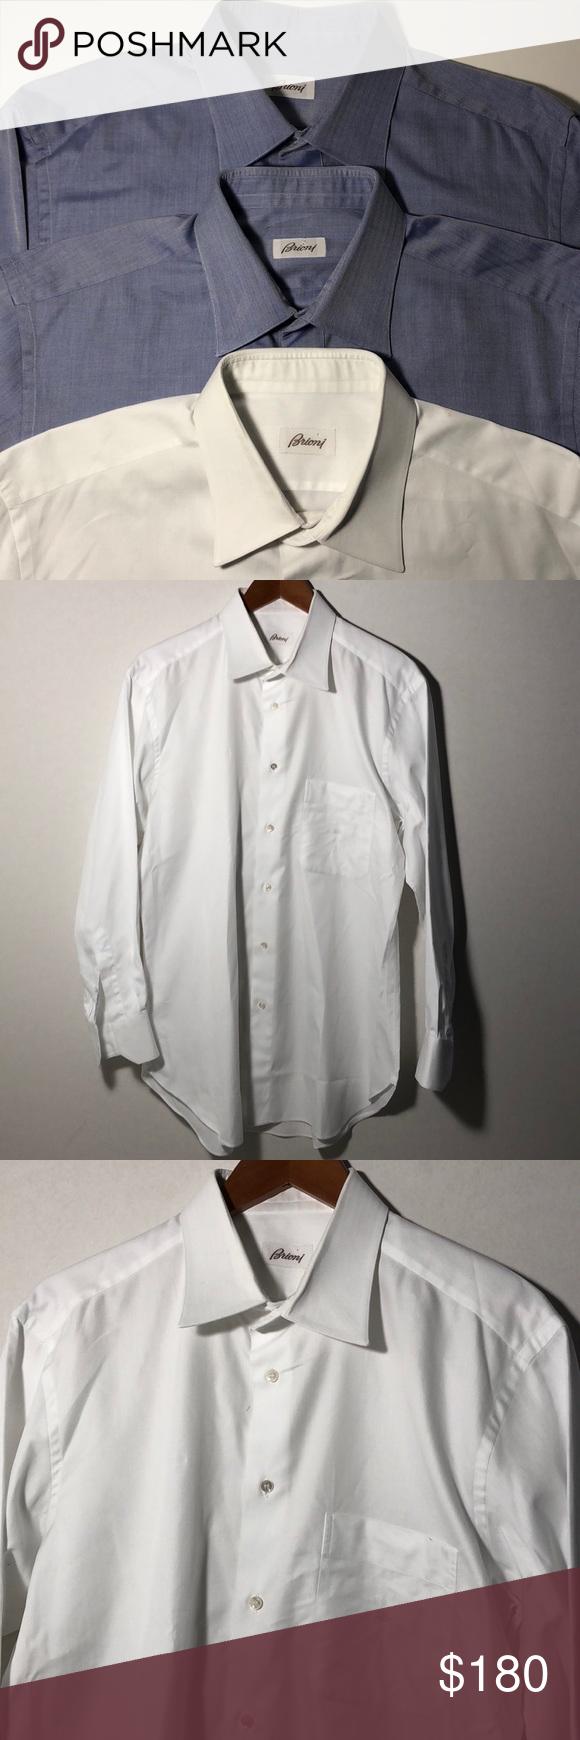 Brioni Dress Shirt Lot Of 3 2 Blue 1 White 1743 All 3 Shirts Had